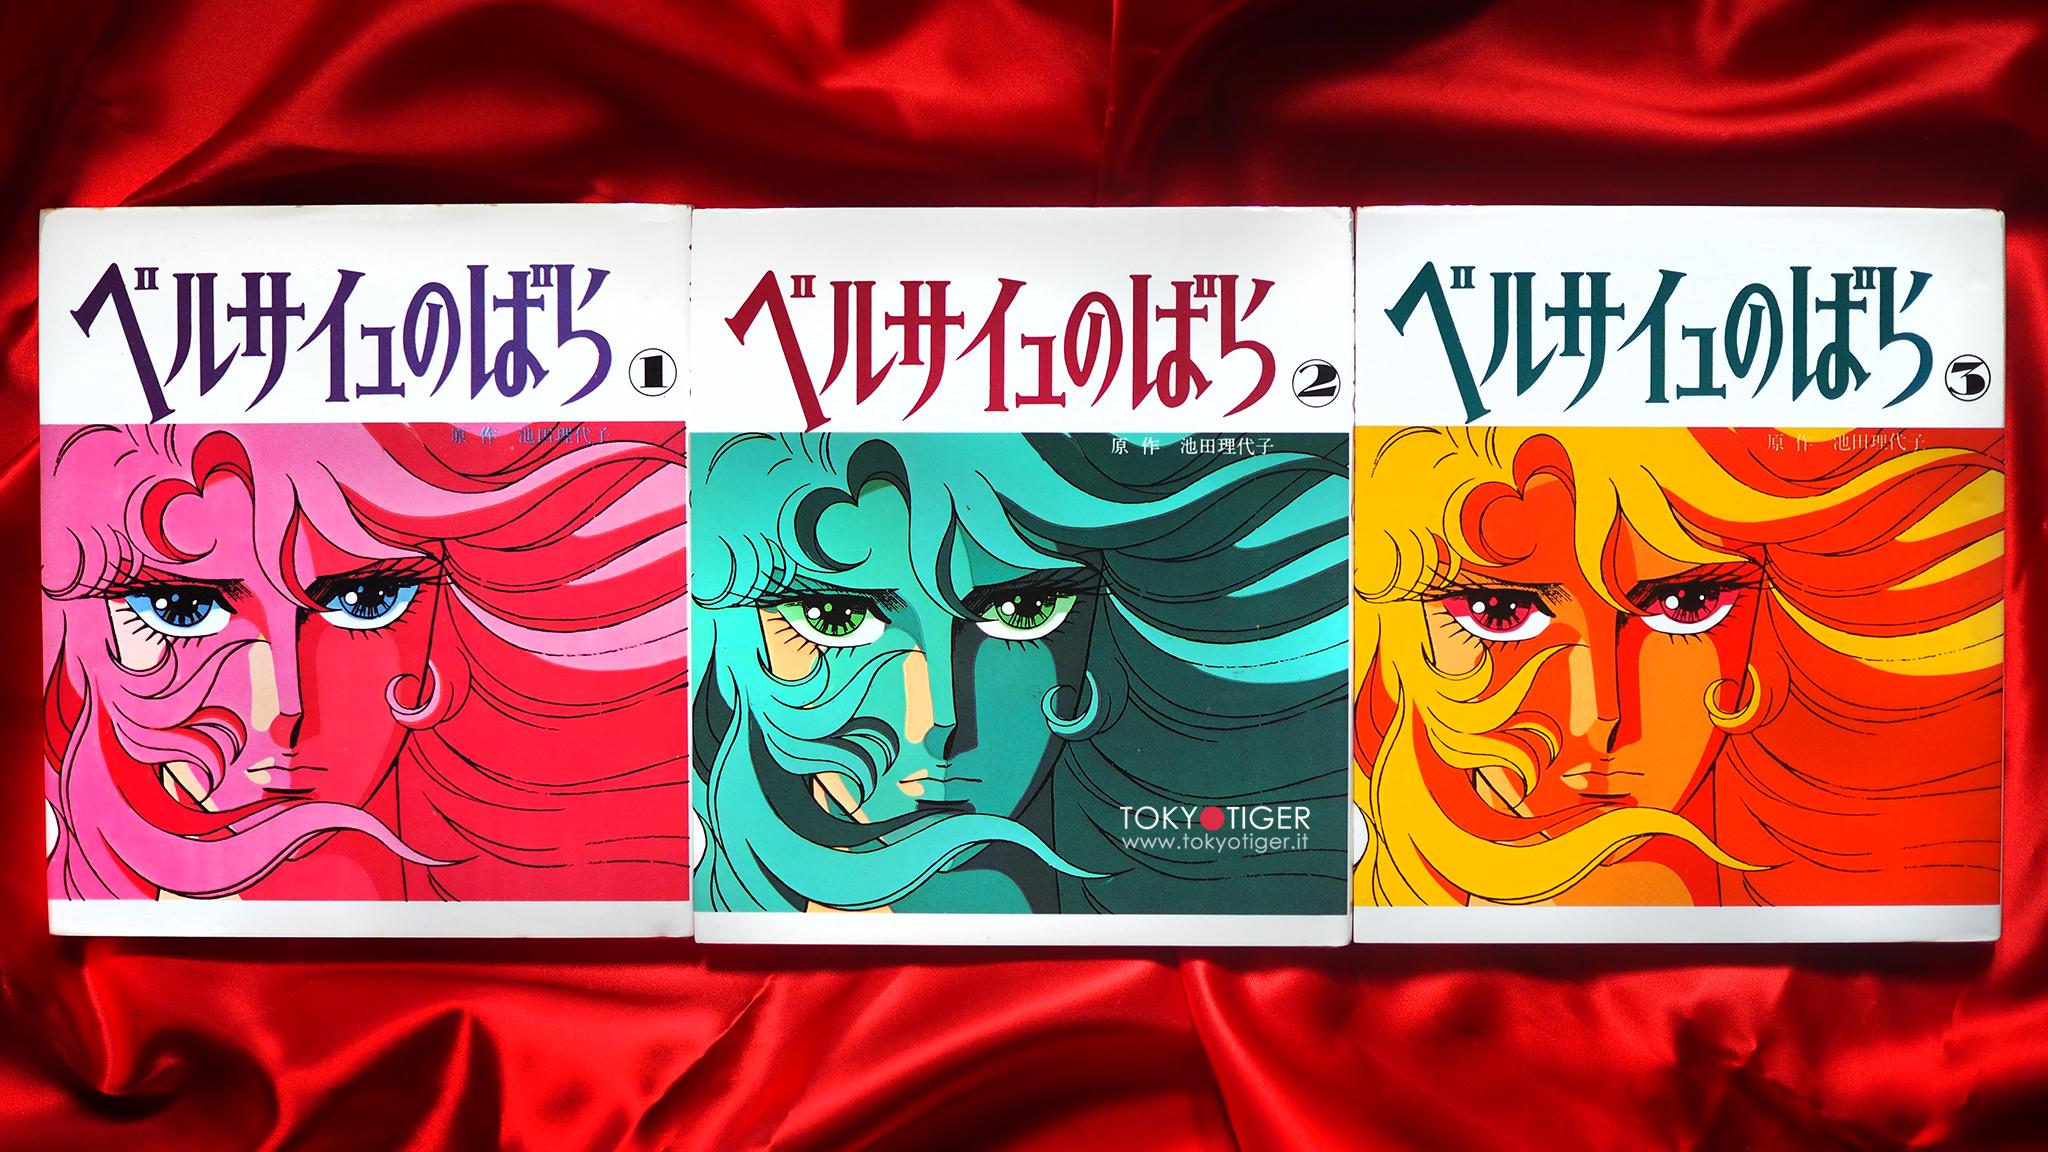 Shingo-araki,michi-himeno,tokyotiger,lady-oscar,versailles-no-bara,akemi-takada